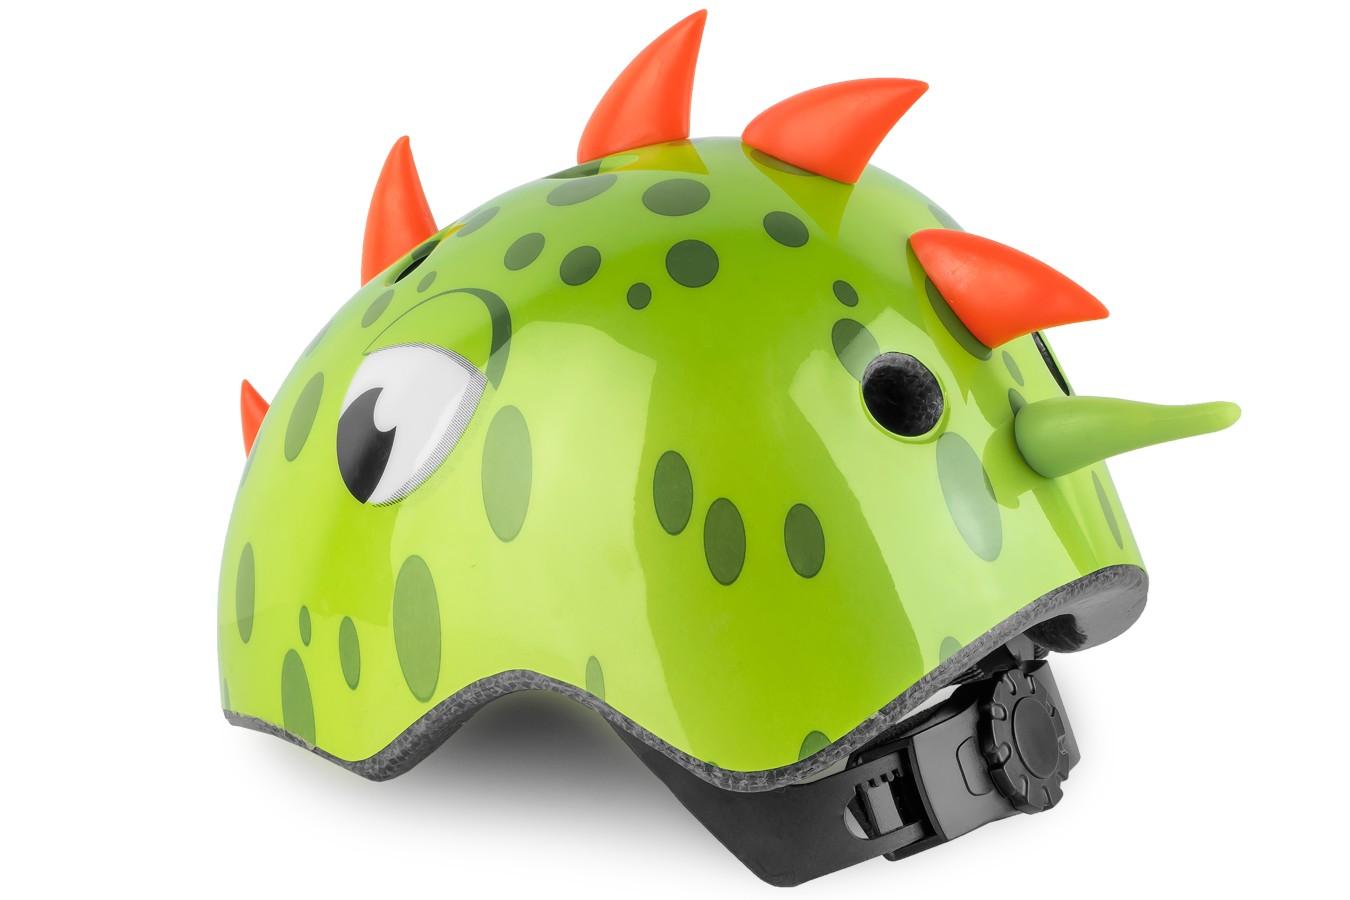 Capacete Ciclista Infantil S-216S Dinossauro - Kidzamo